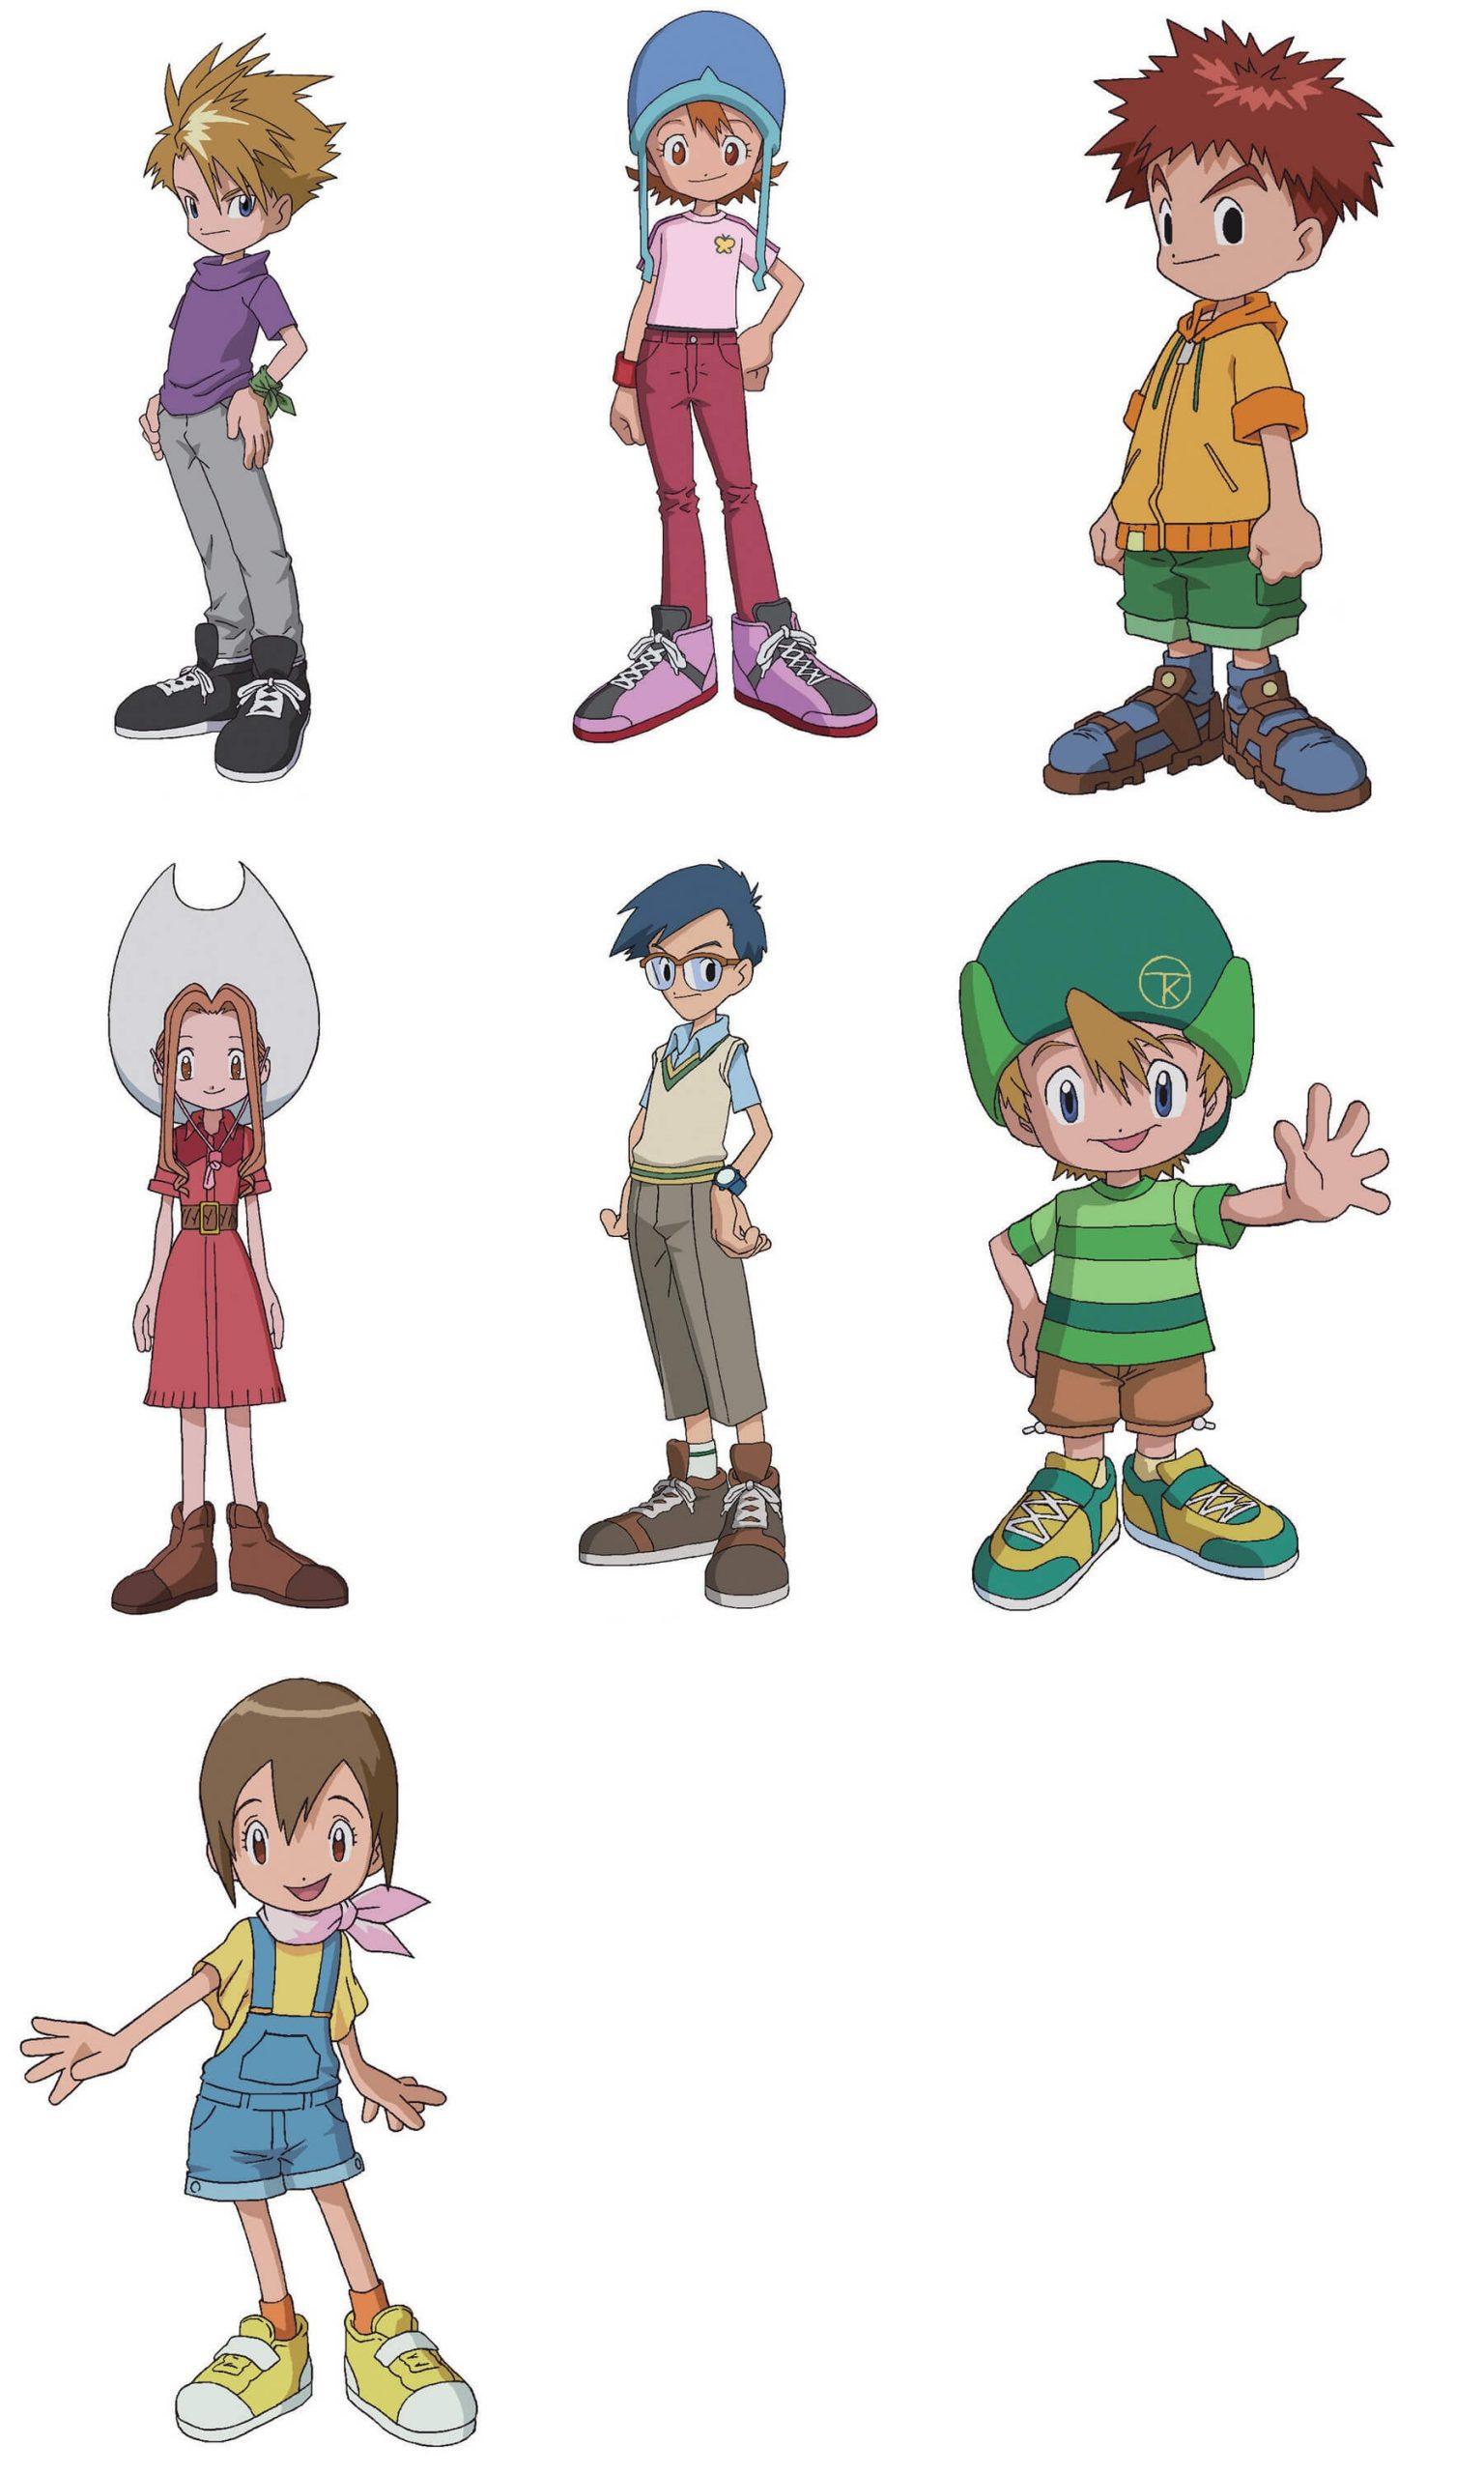 Digimon Adventure diseño de personajes